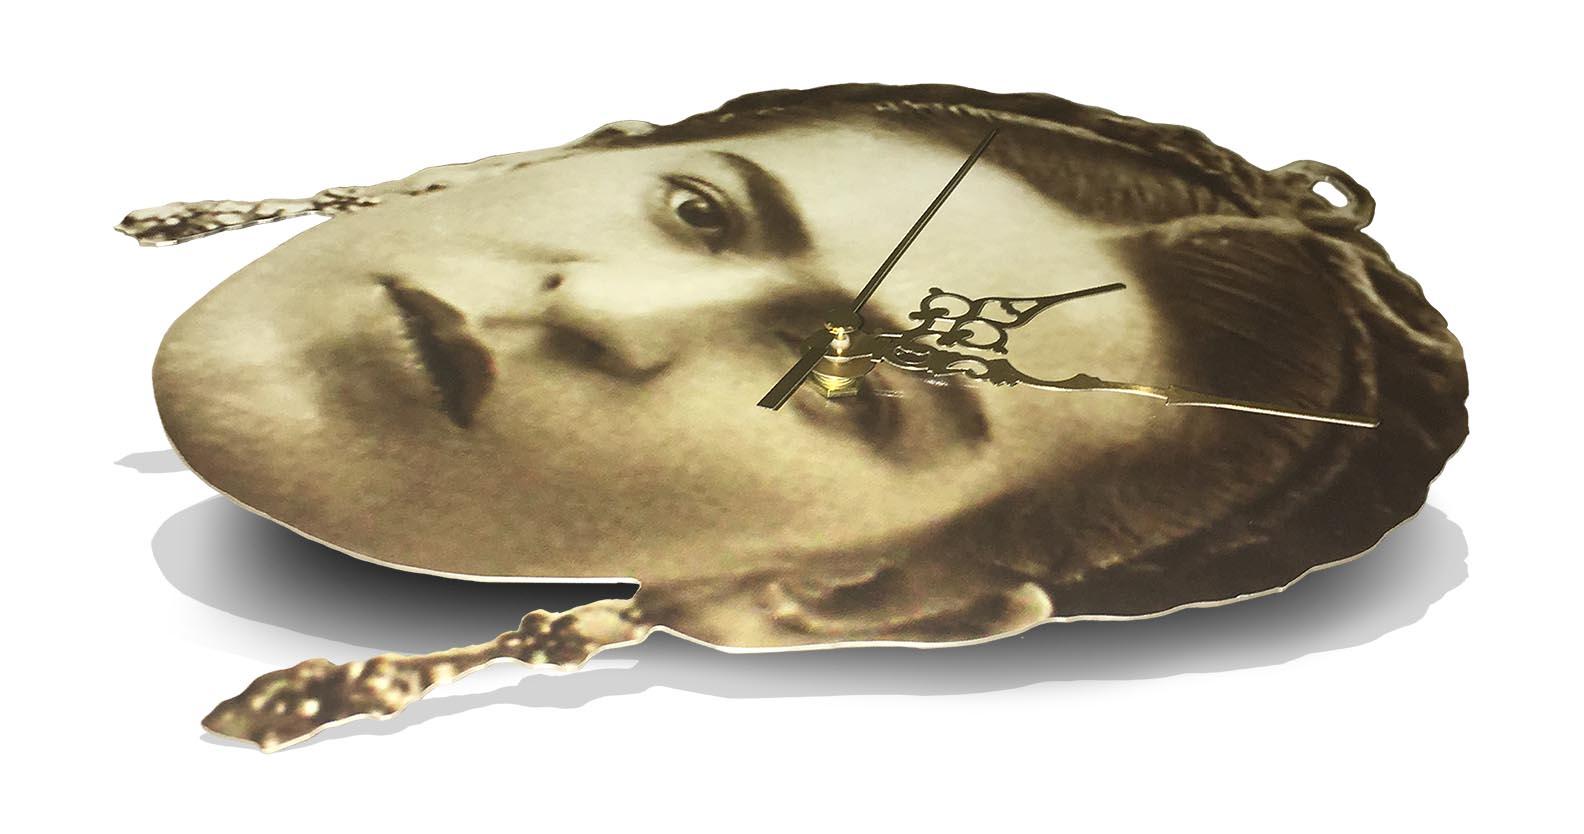 ClockWork Cros, Frida Kahlo